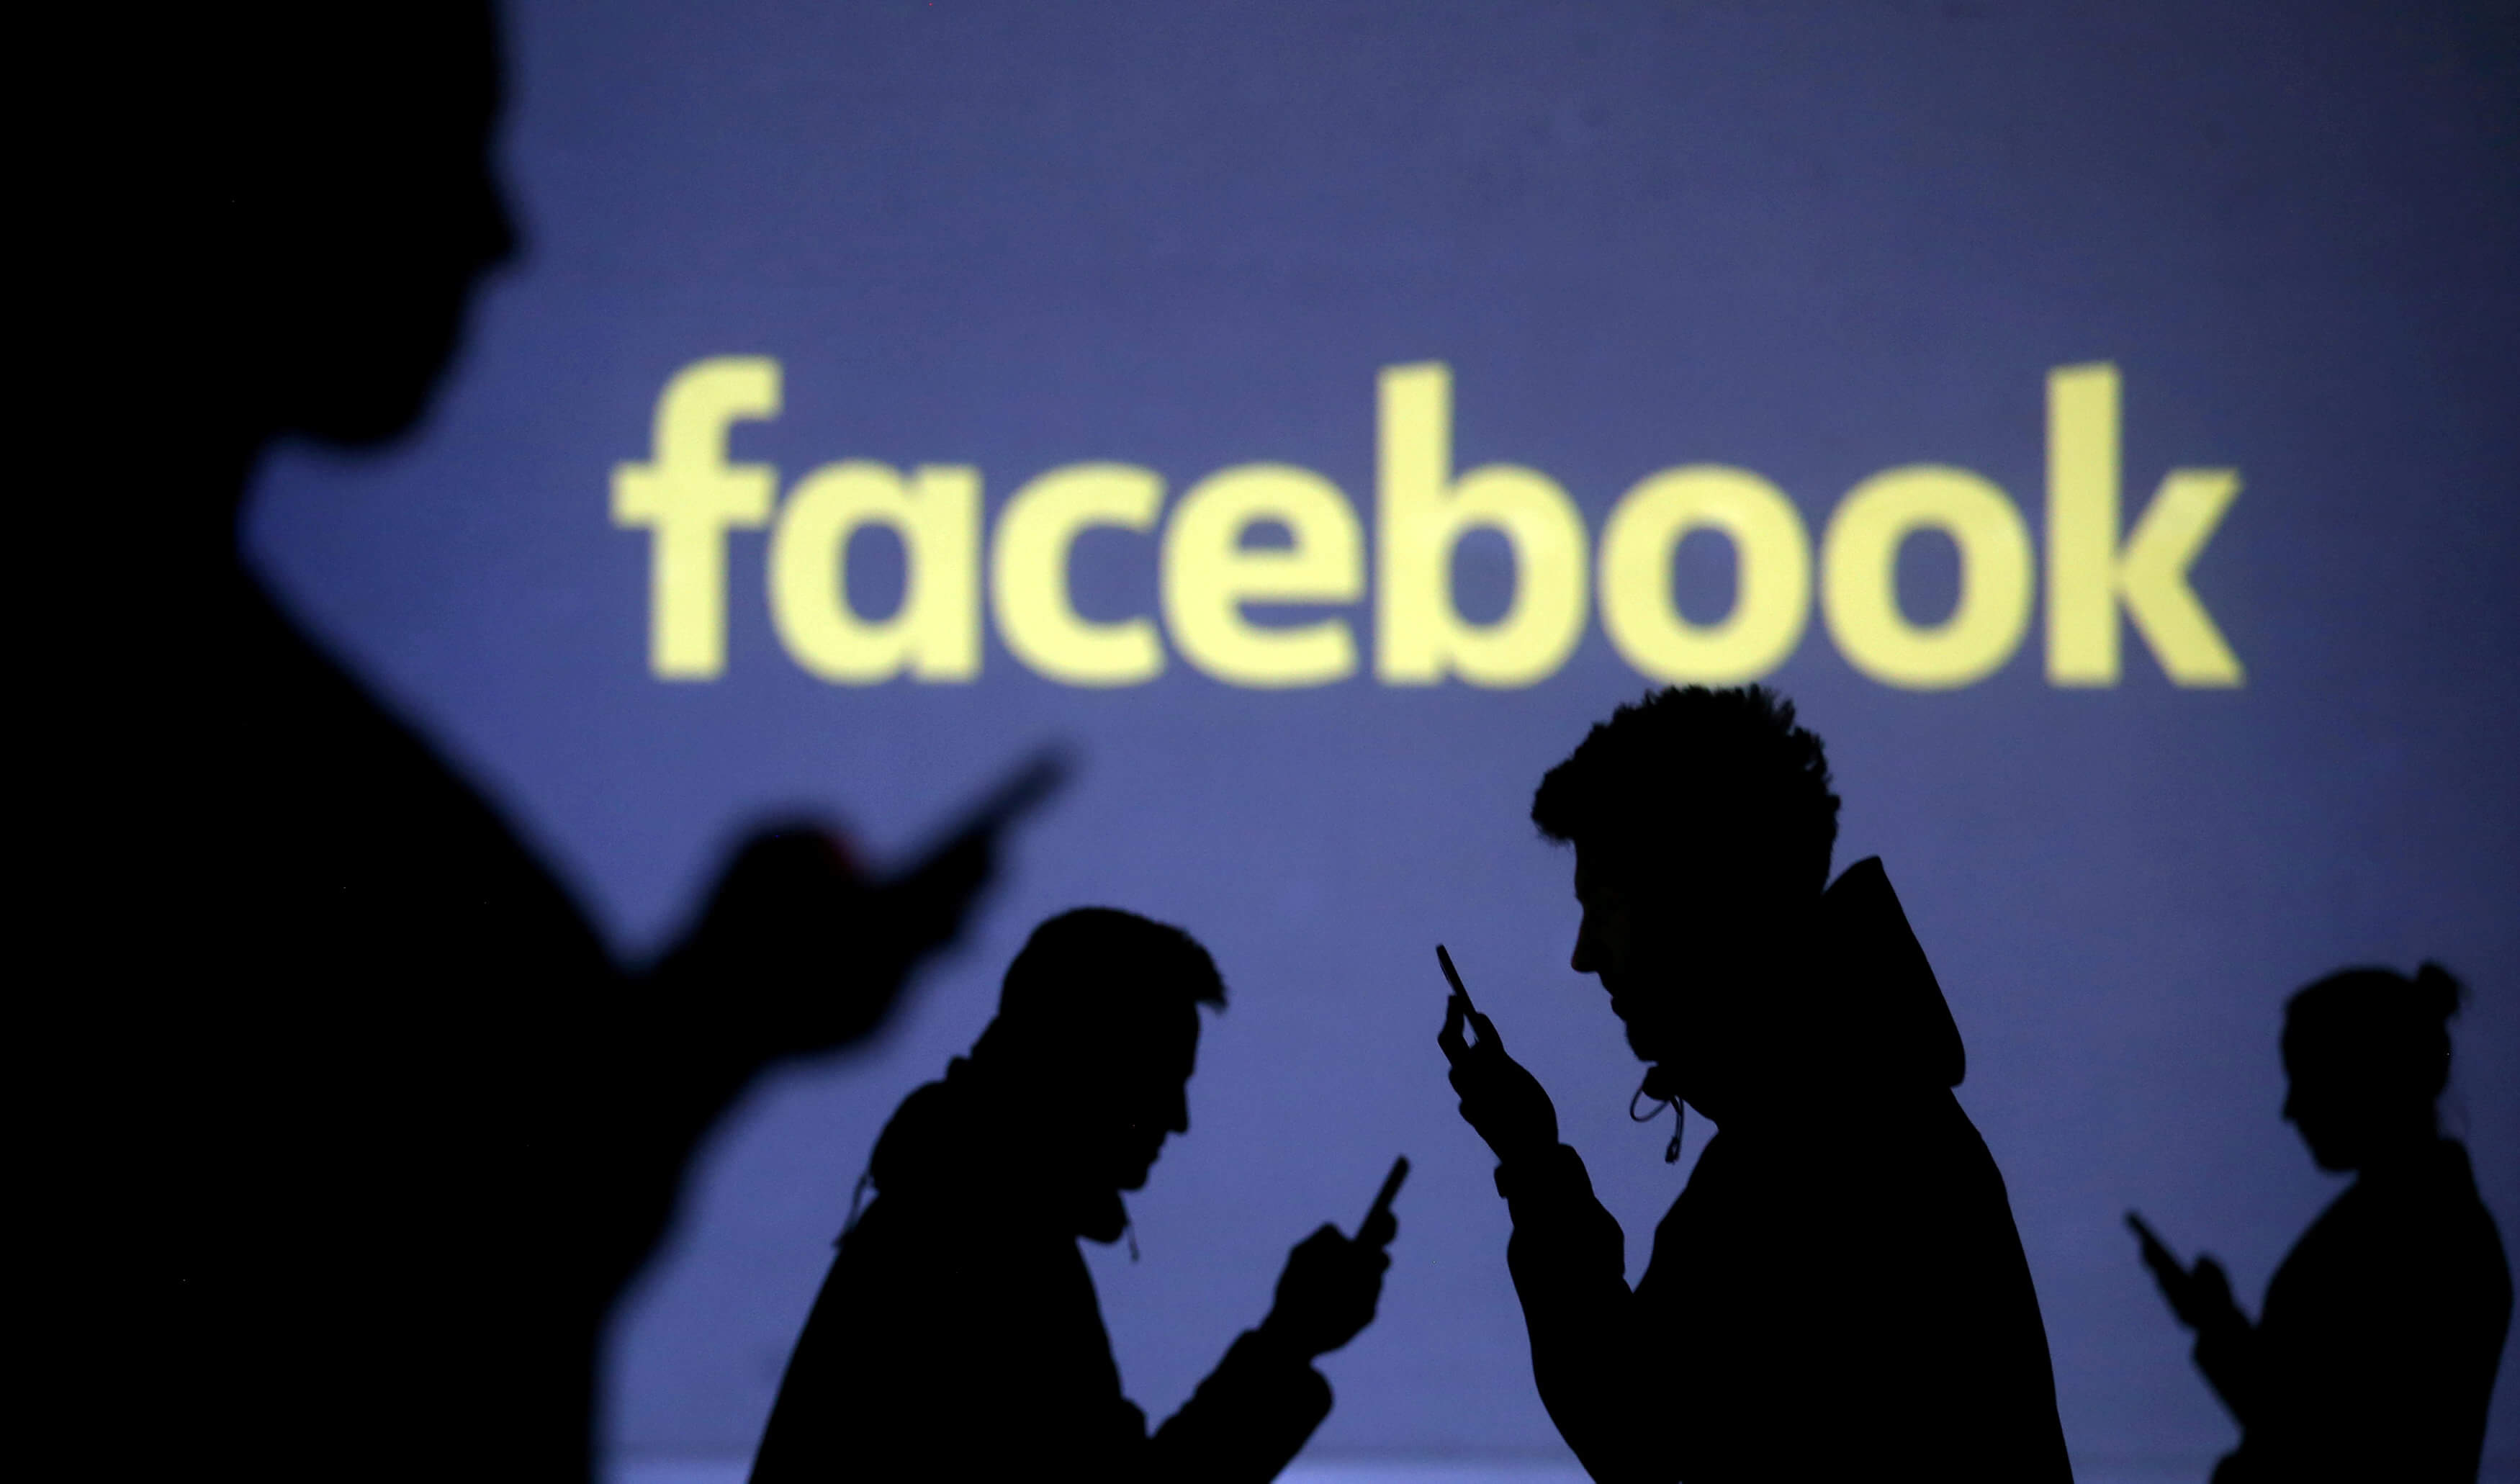 Facebook: Επιδιώκει πλέον να διαβάζει το μυαλό μας και να αντλεί νέα δεδομένα